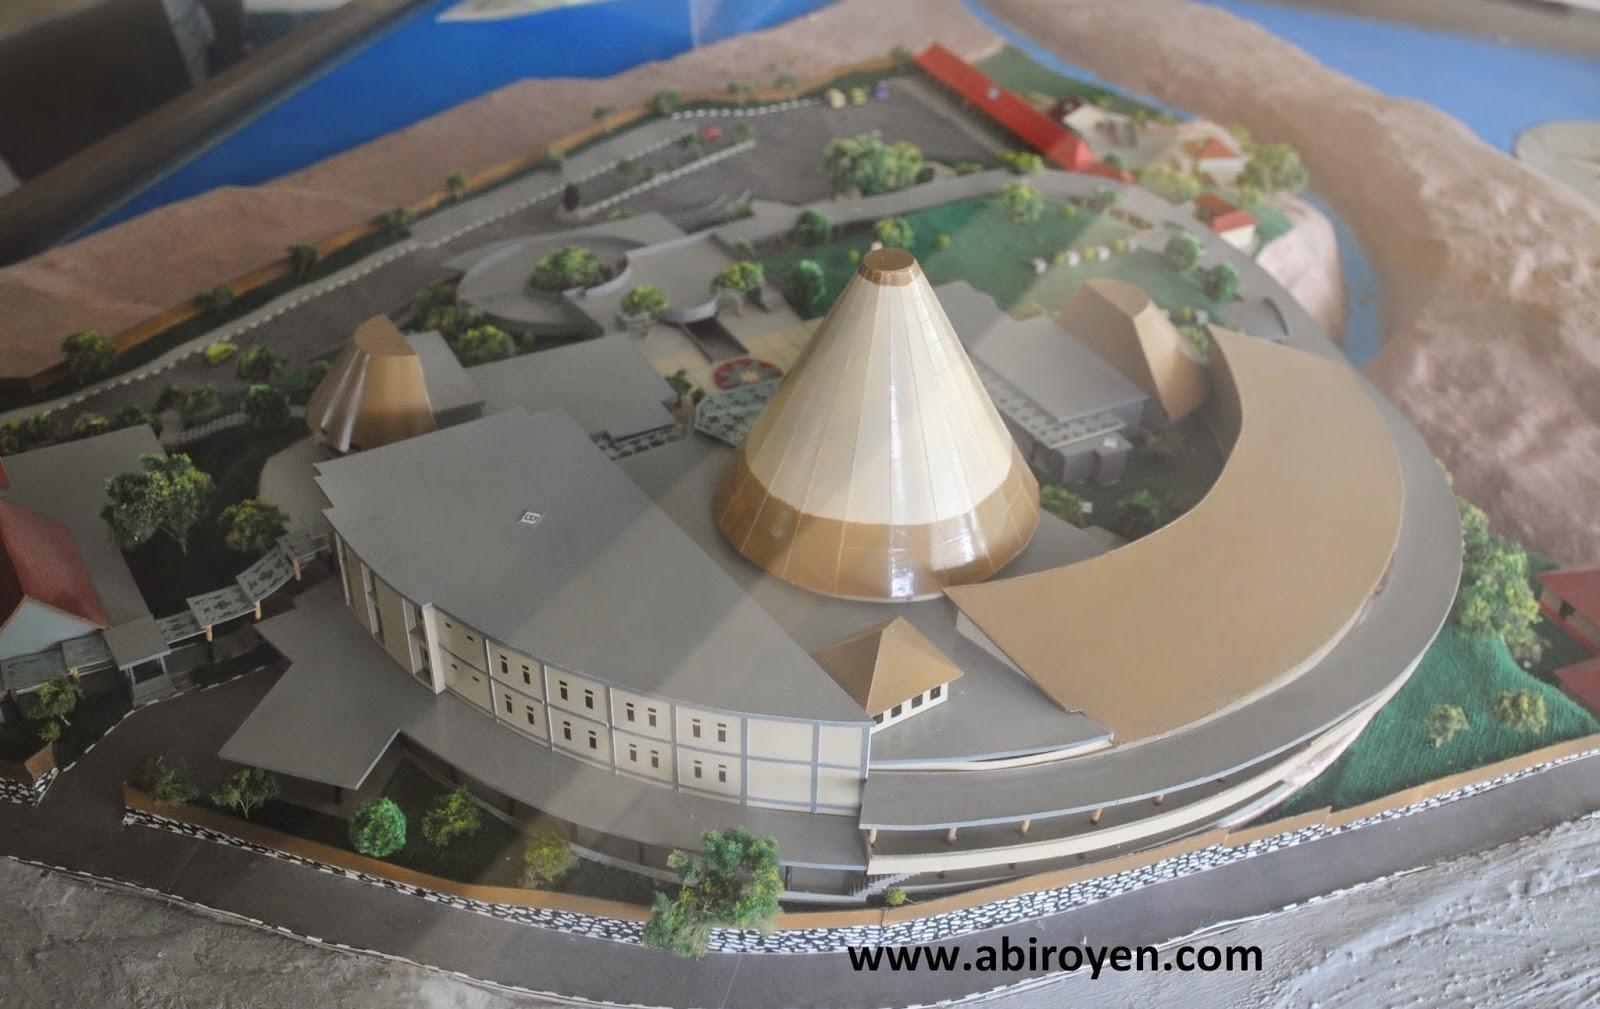 Museum Purbakala Sangiran Sragen Akses Masuk Keunikannya Maket 2bsangiran Jalan